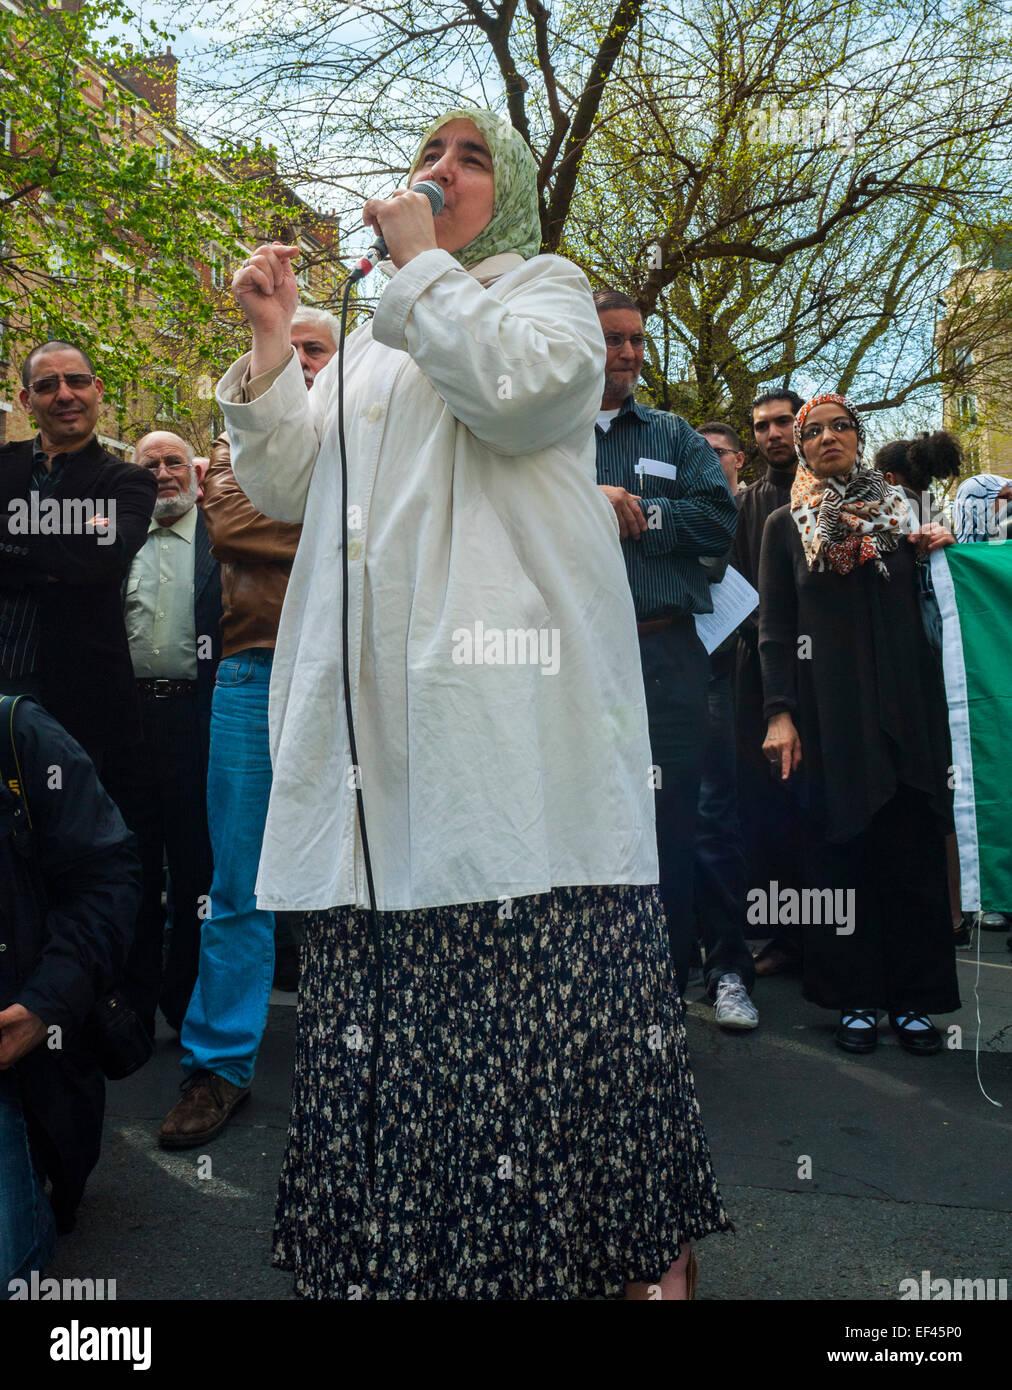 Paris, France, French Arab Muslims Demonstrating against Islamophobia, Racism, Woman Speaker on Street - Stock Image